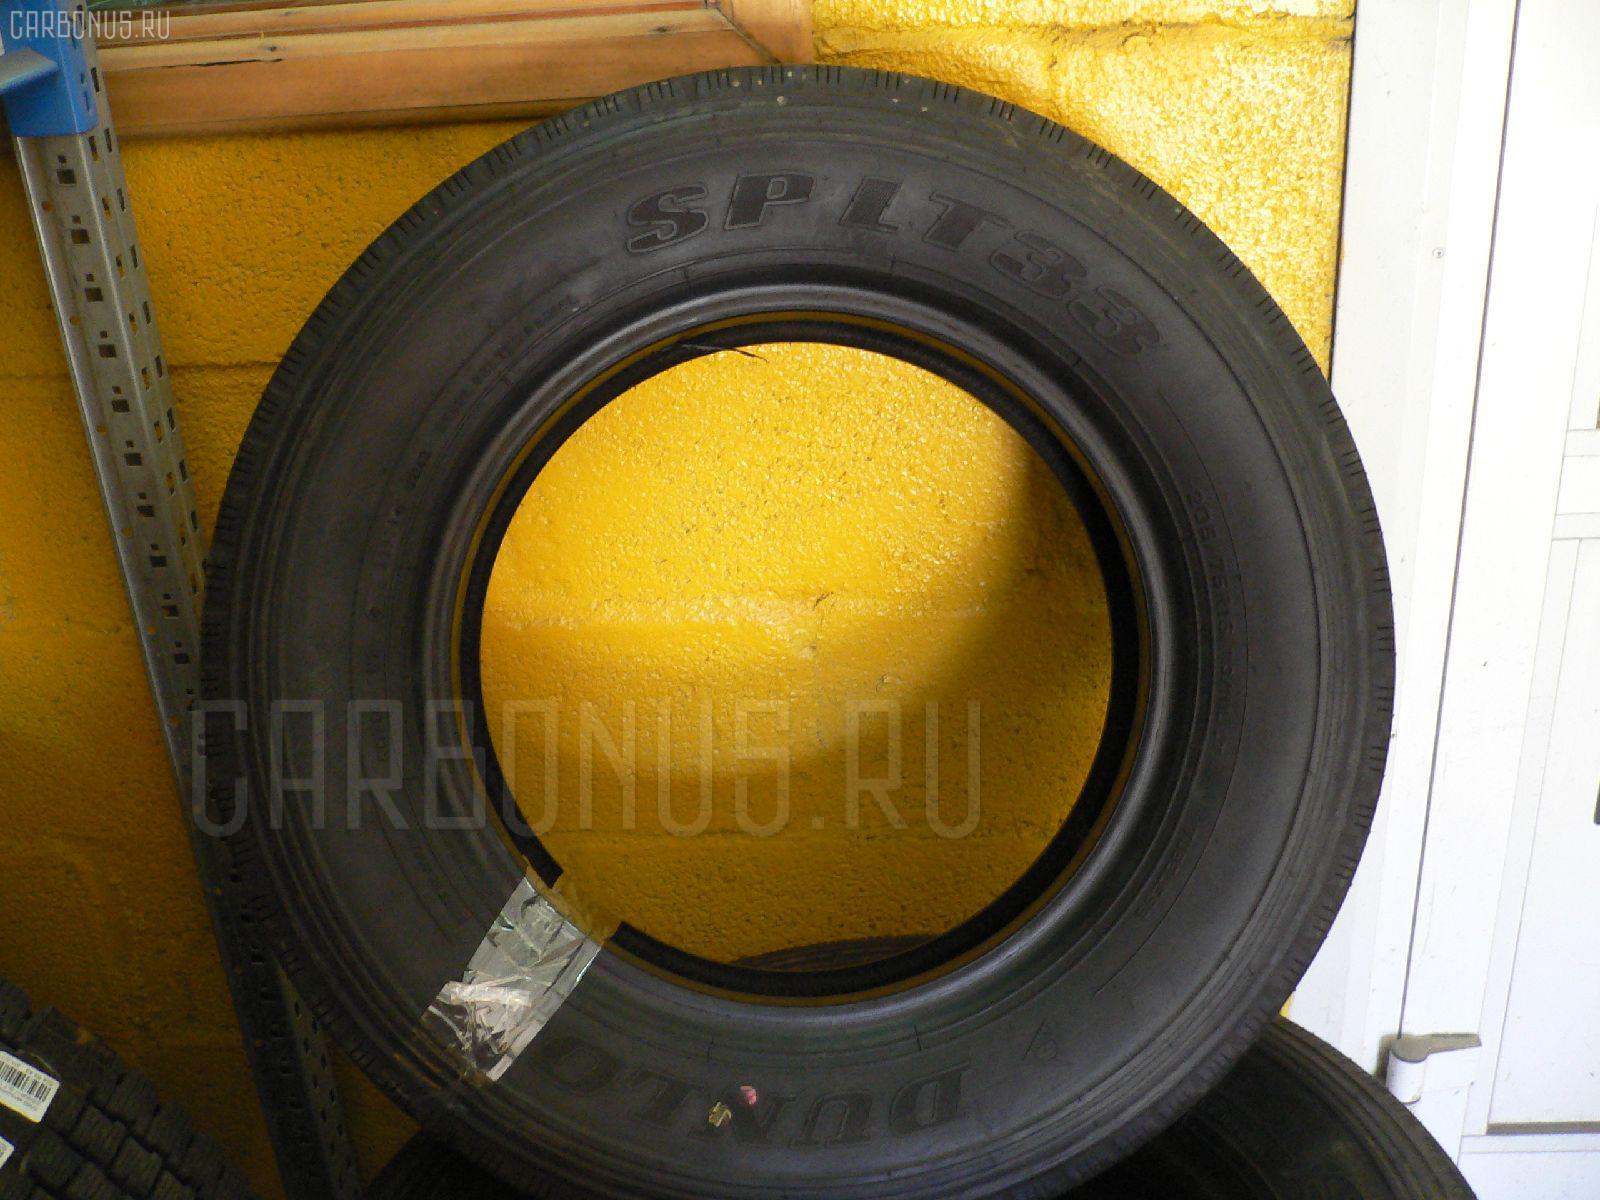 Автошина грузовая летняя SPLT33 205/75R16LT DUNLOP Фото 2